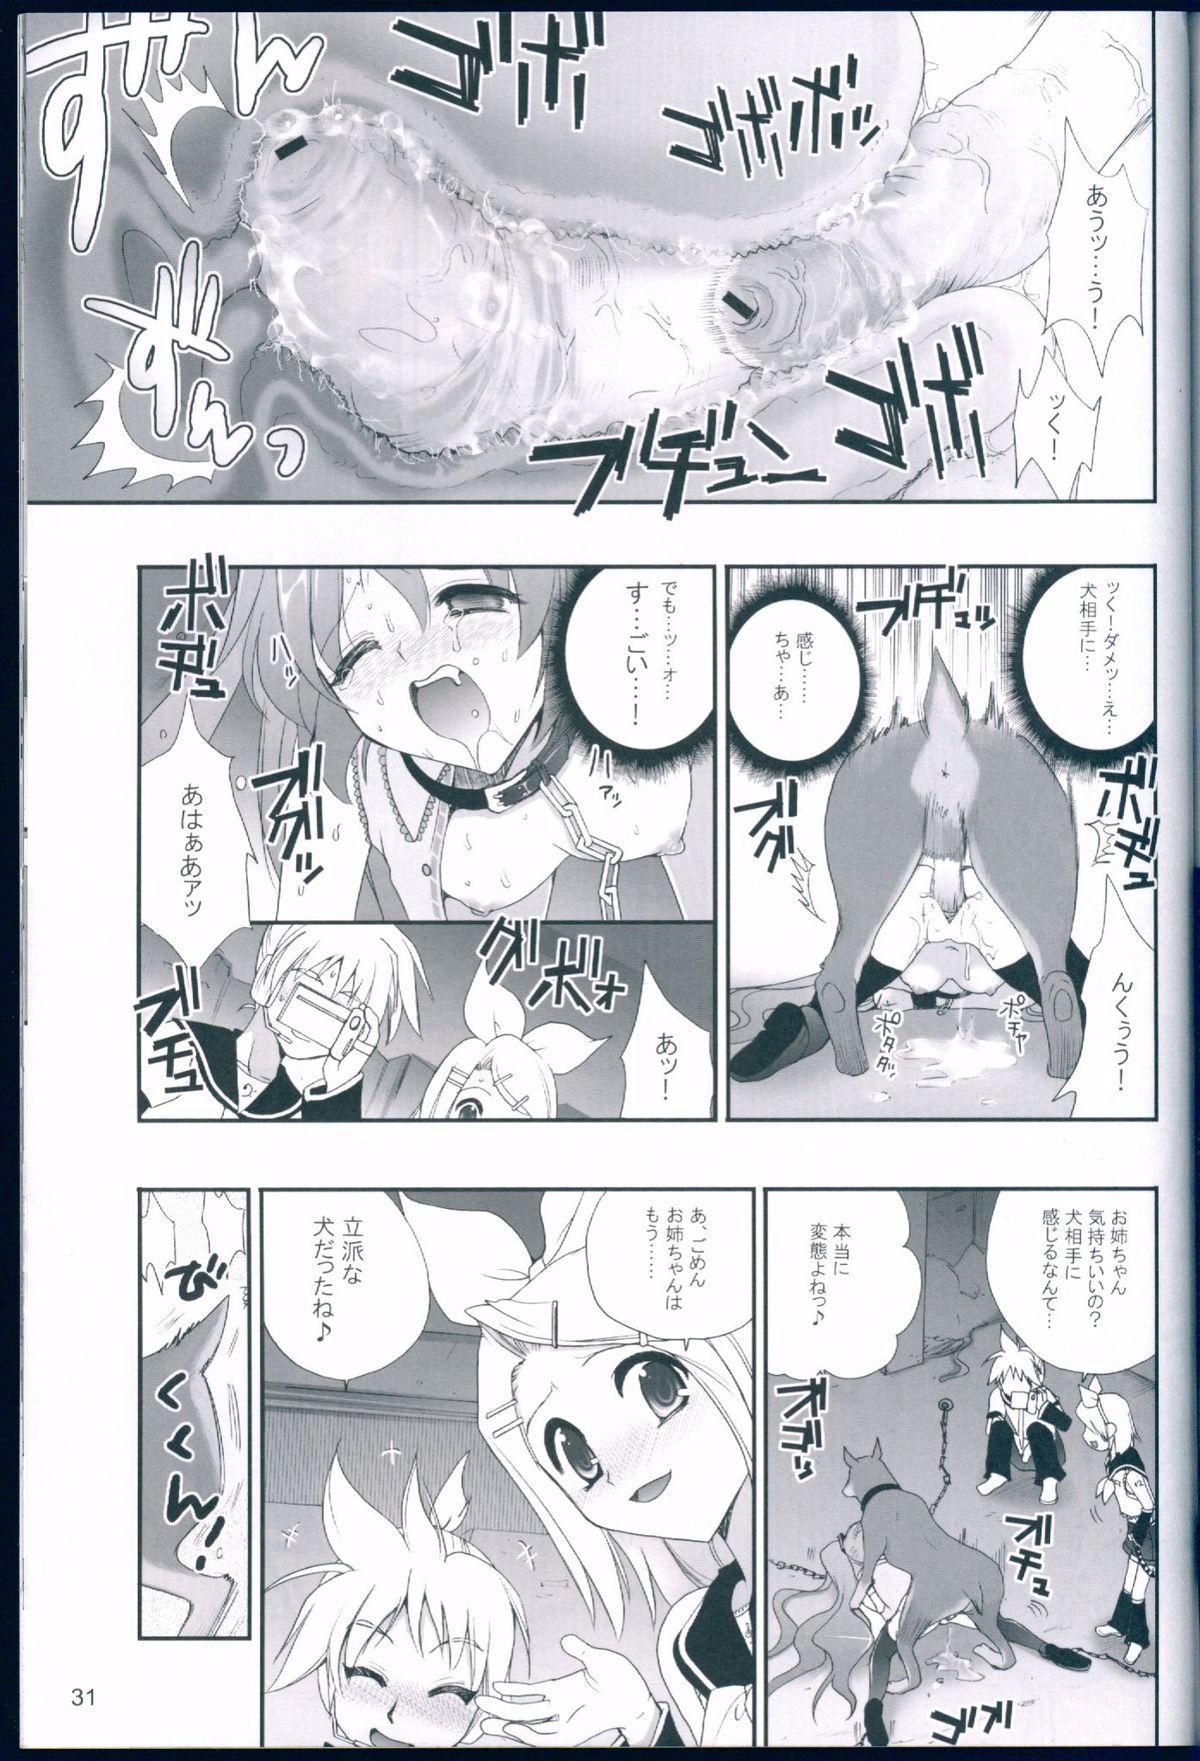 R Juu - Hatsune Miku Kenkan 28